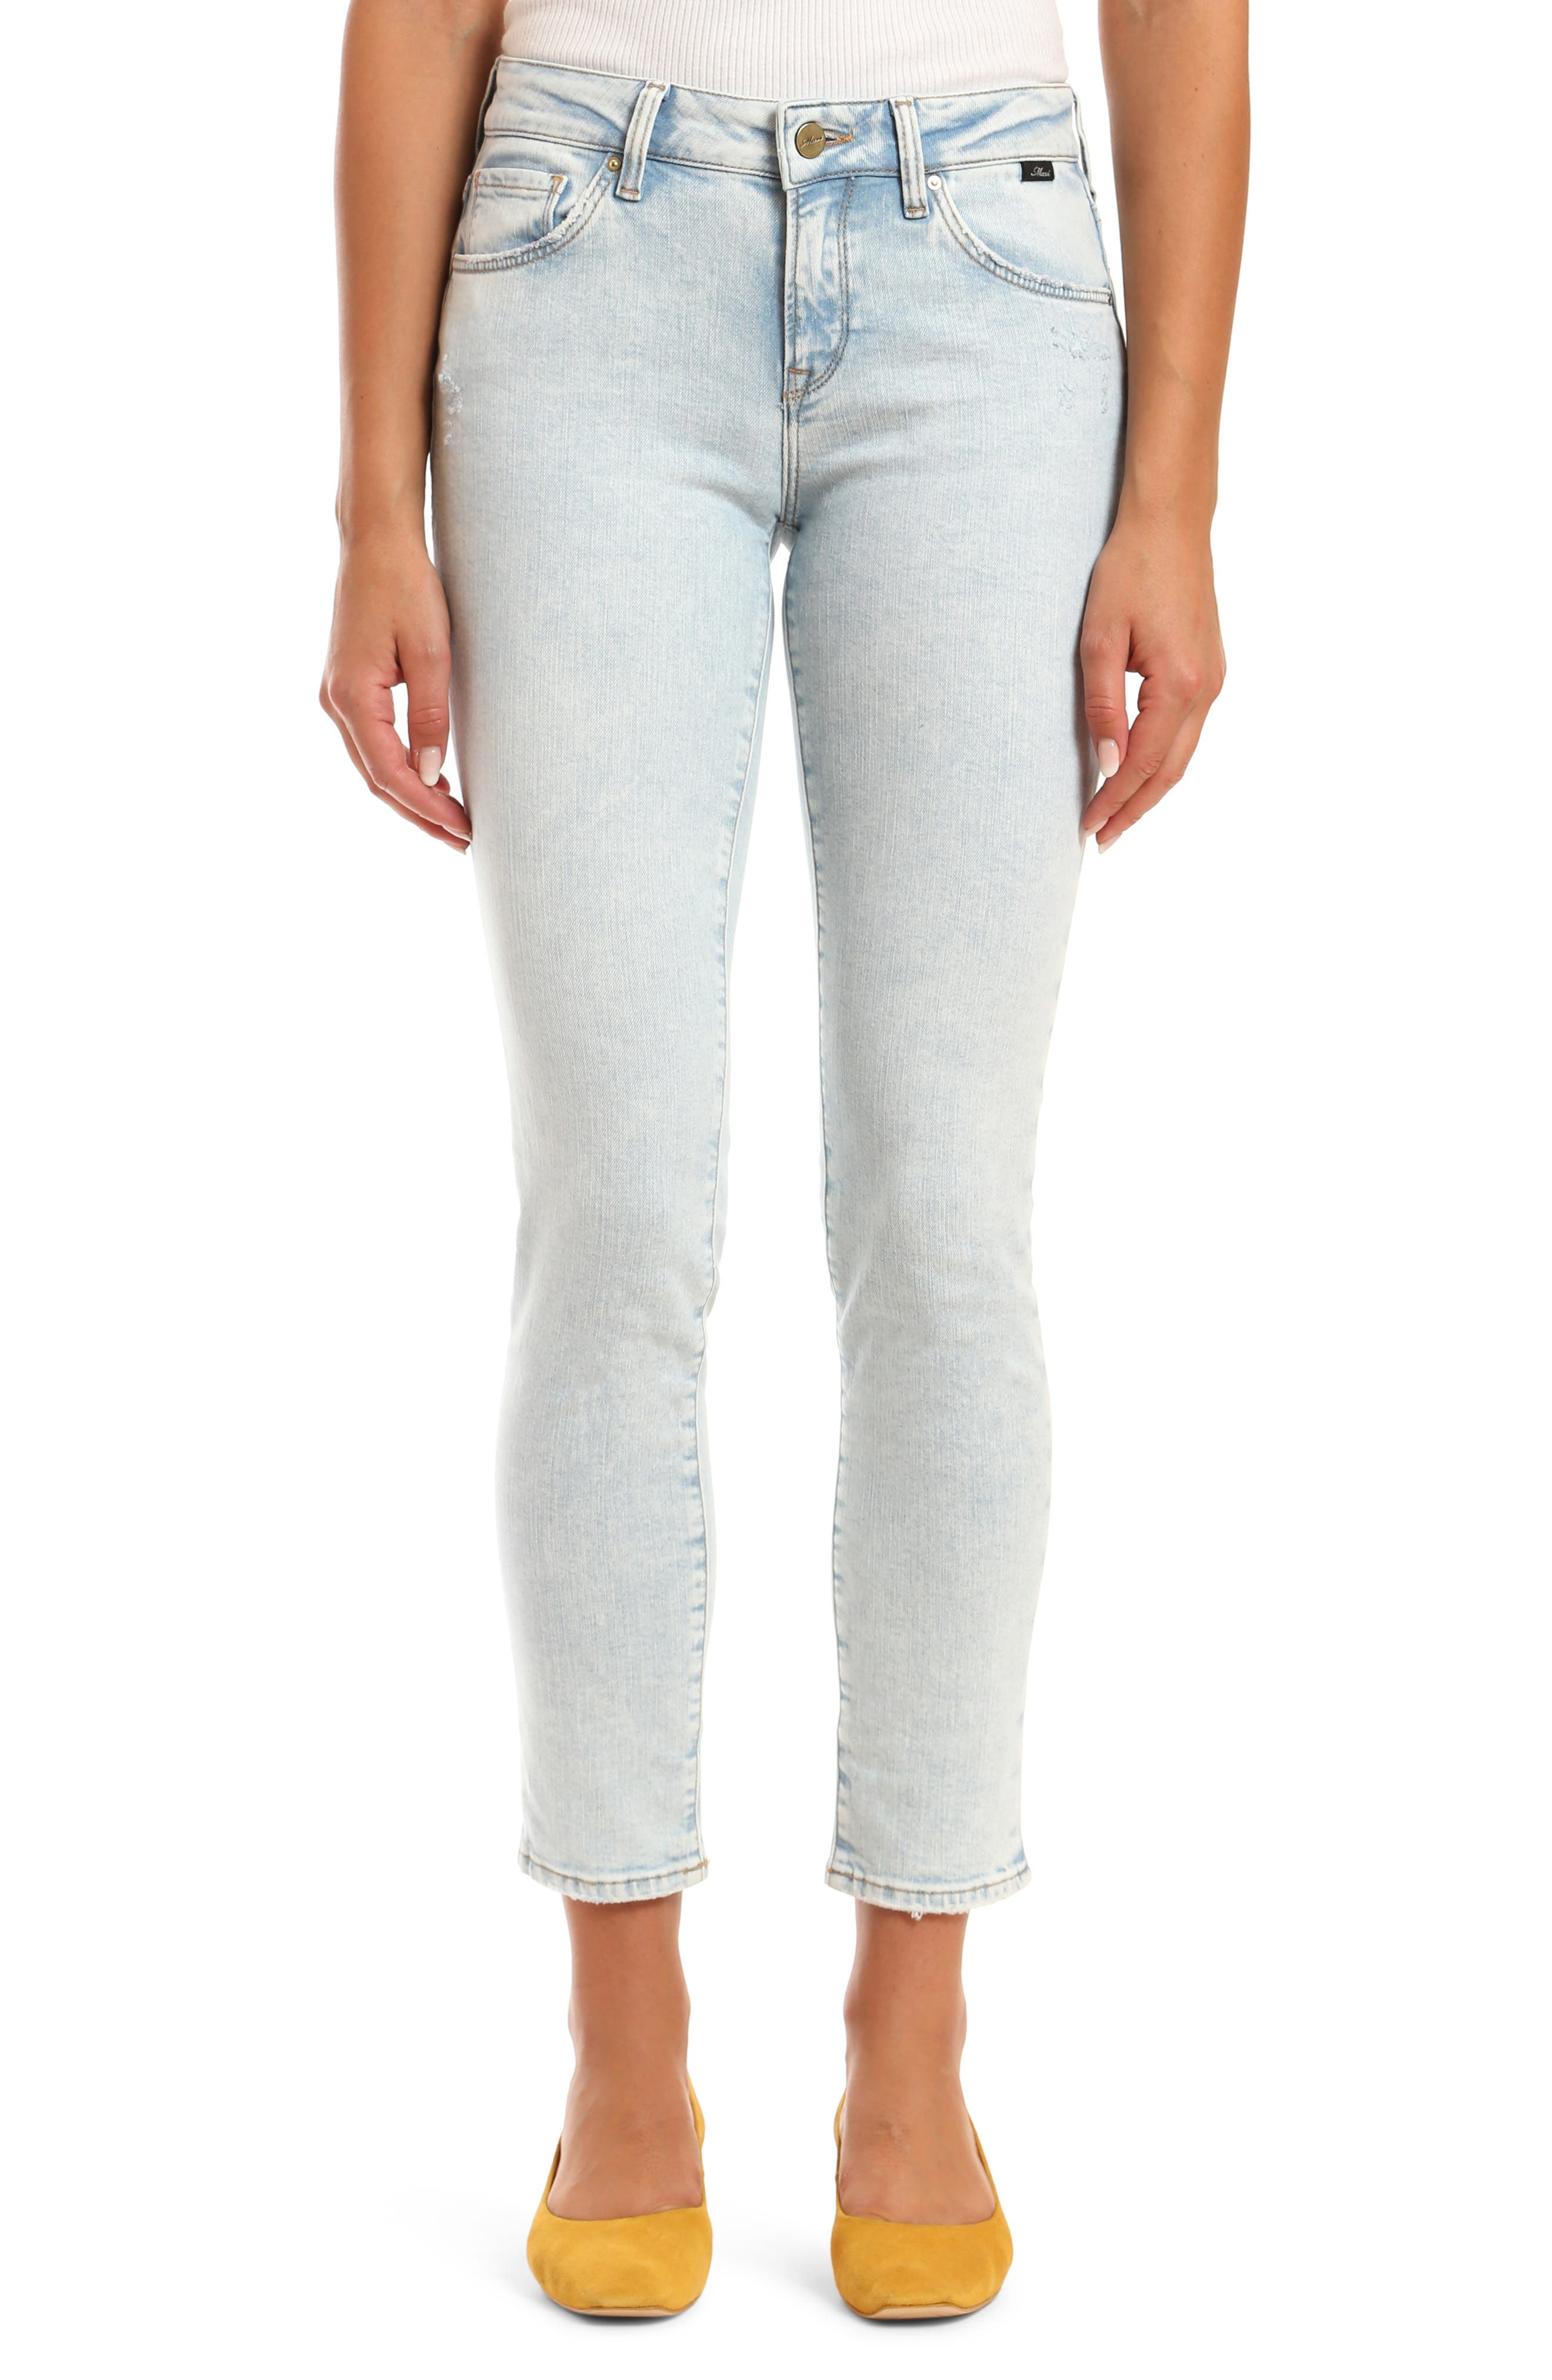 Vintage High Waisted Trousers, Sailor Pants, Jeans Womens Mavi Jeans Ada Distressed Ankle Boyfriend Jeans $118.00 AT vintagedancer.com